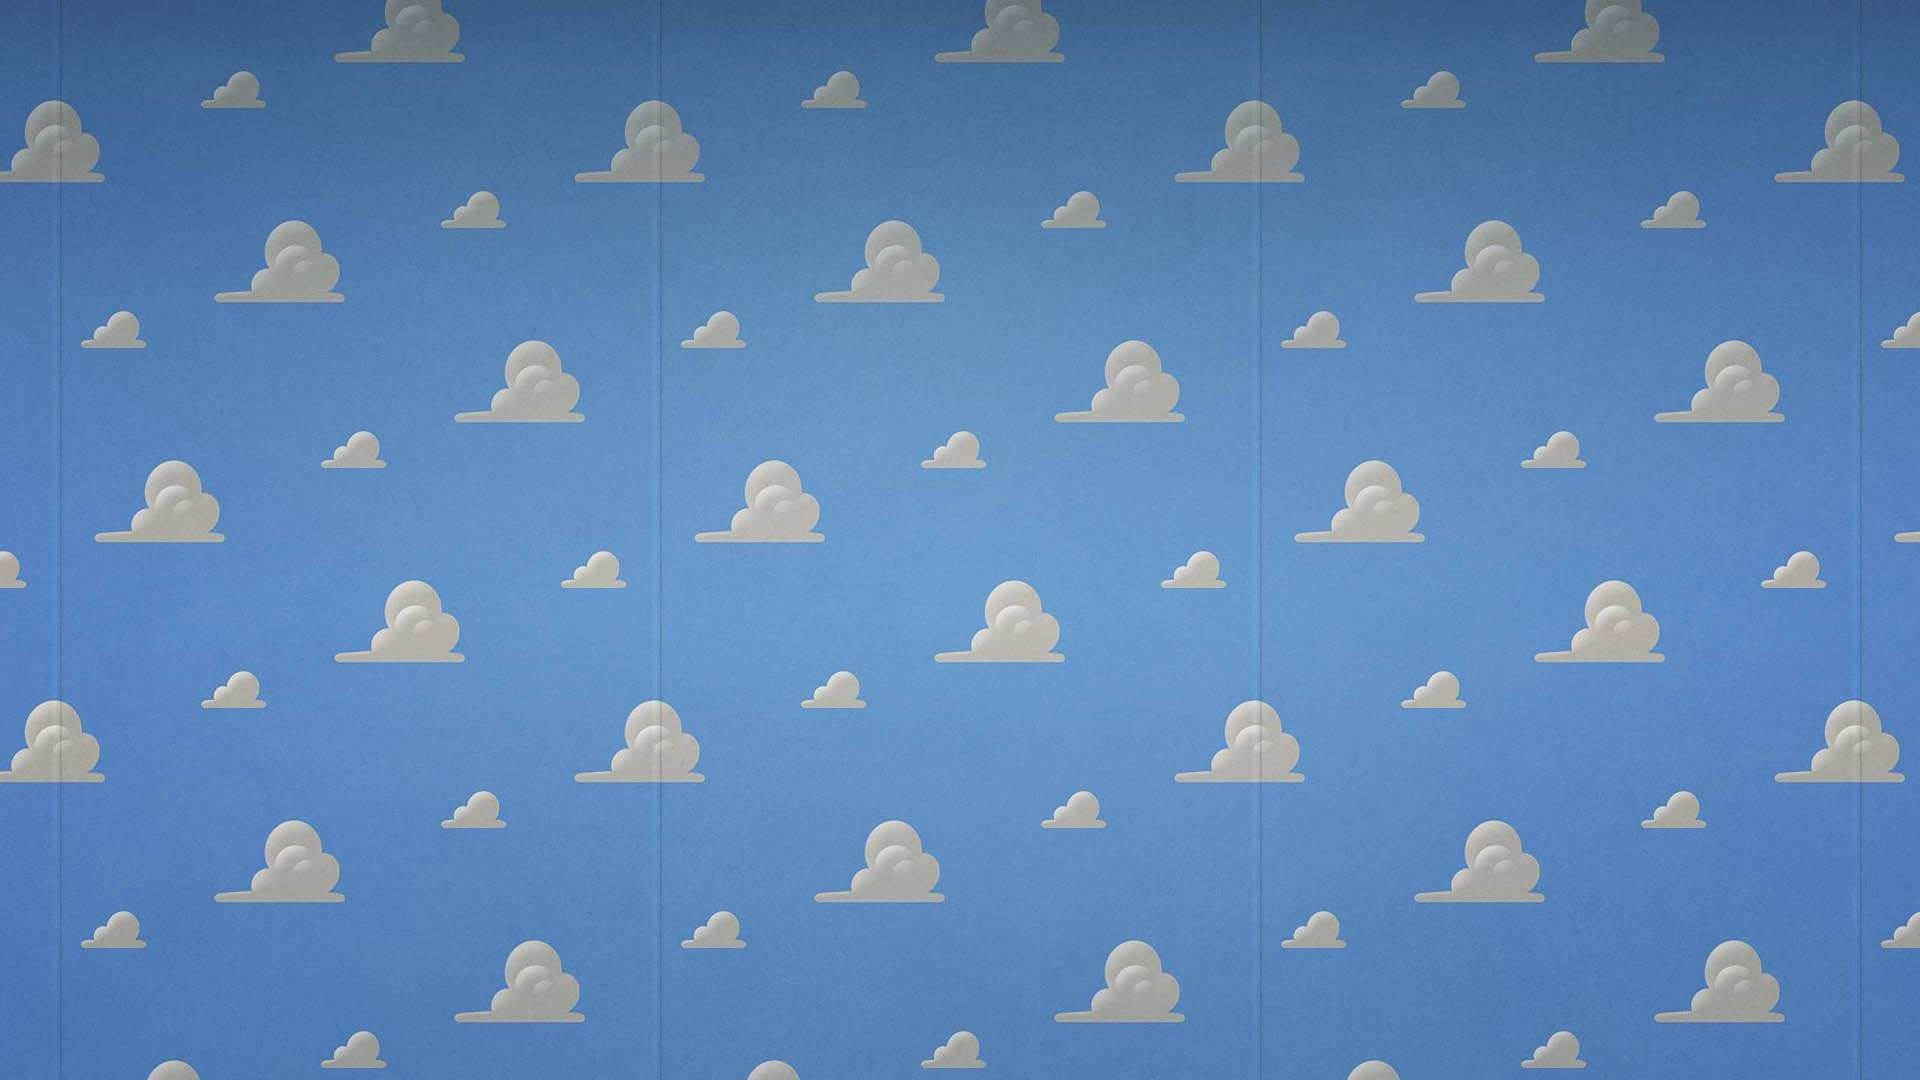 × » Download Wallpaper 1440×900 Toy Story Cloud Wallpapers (21 Wallpapers)  | Adorable Wallpapers | Desktop | Pinterest | Toy story clouds, Cloud  wallpaper …